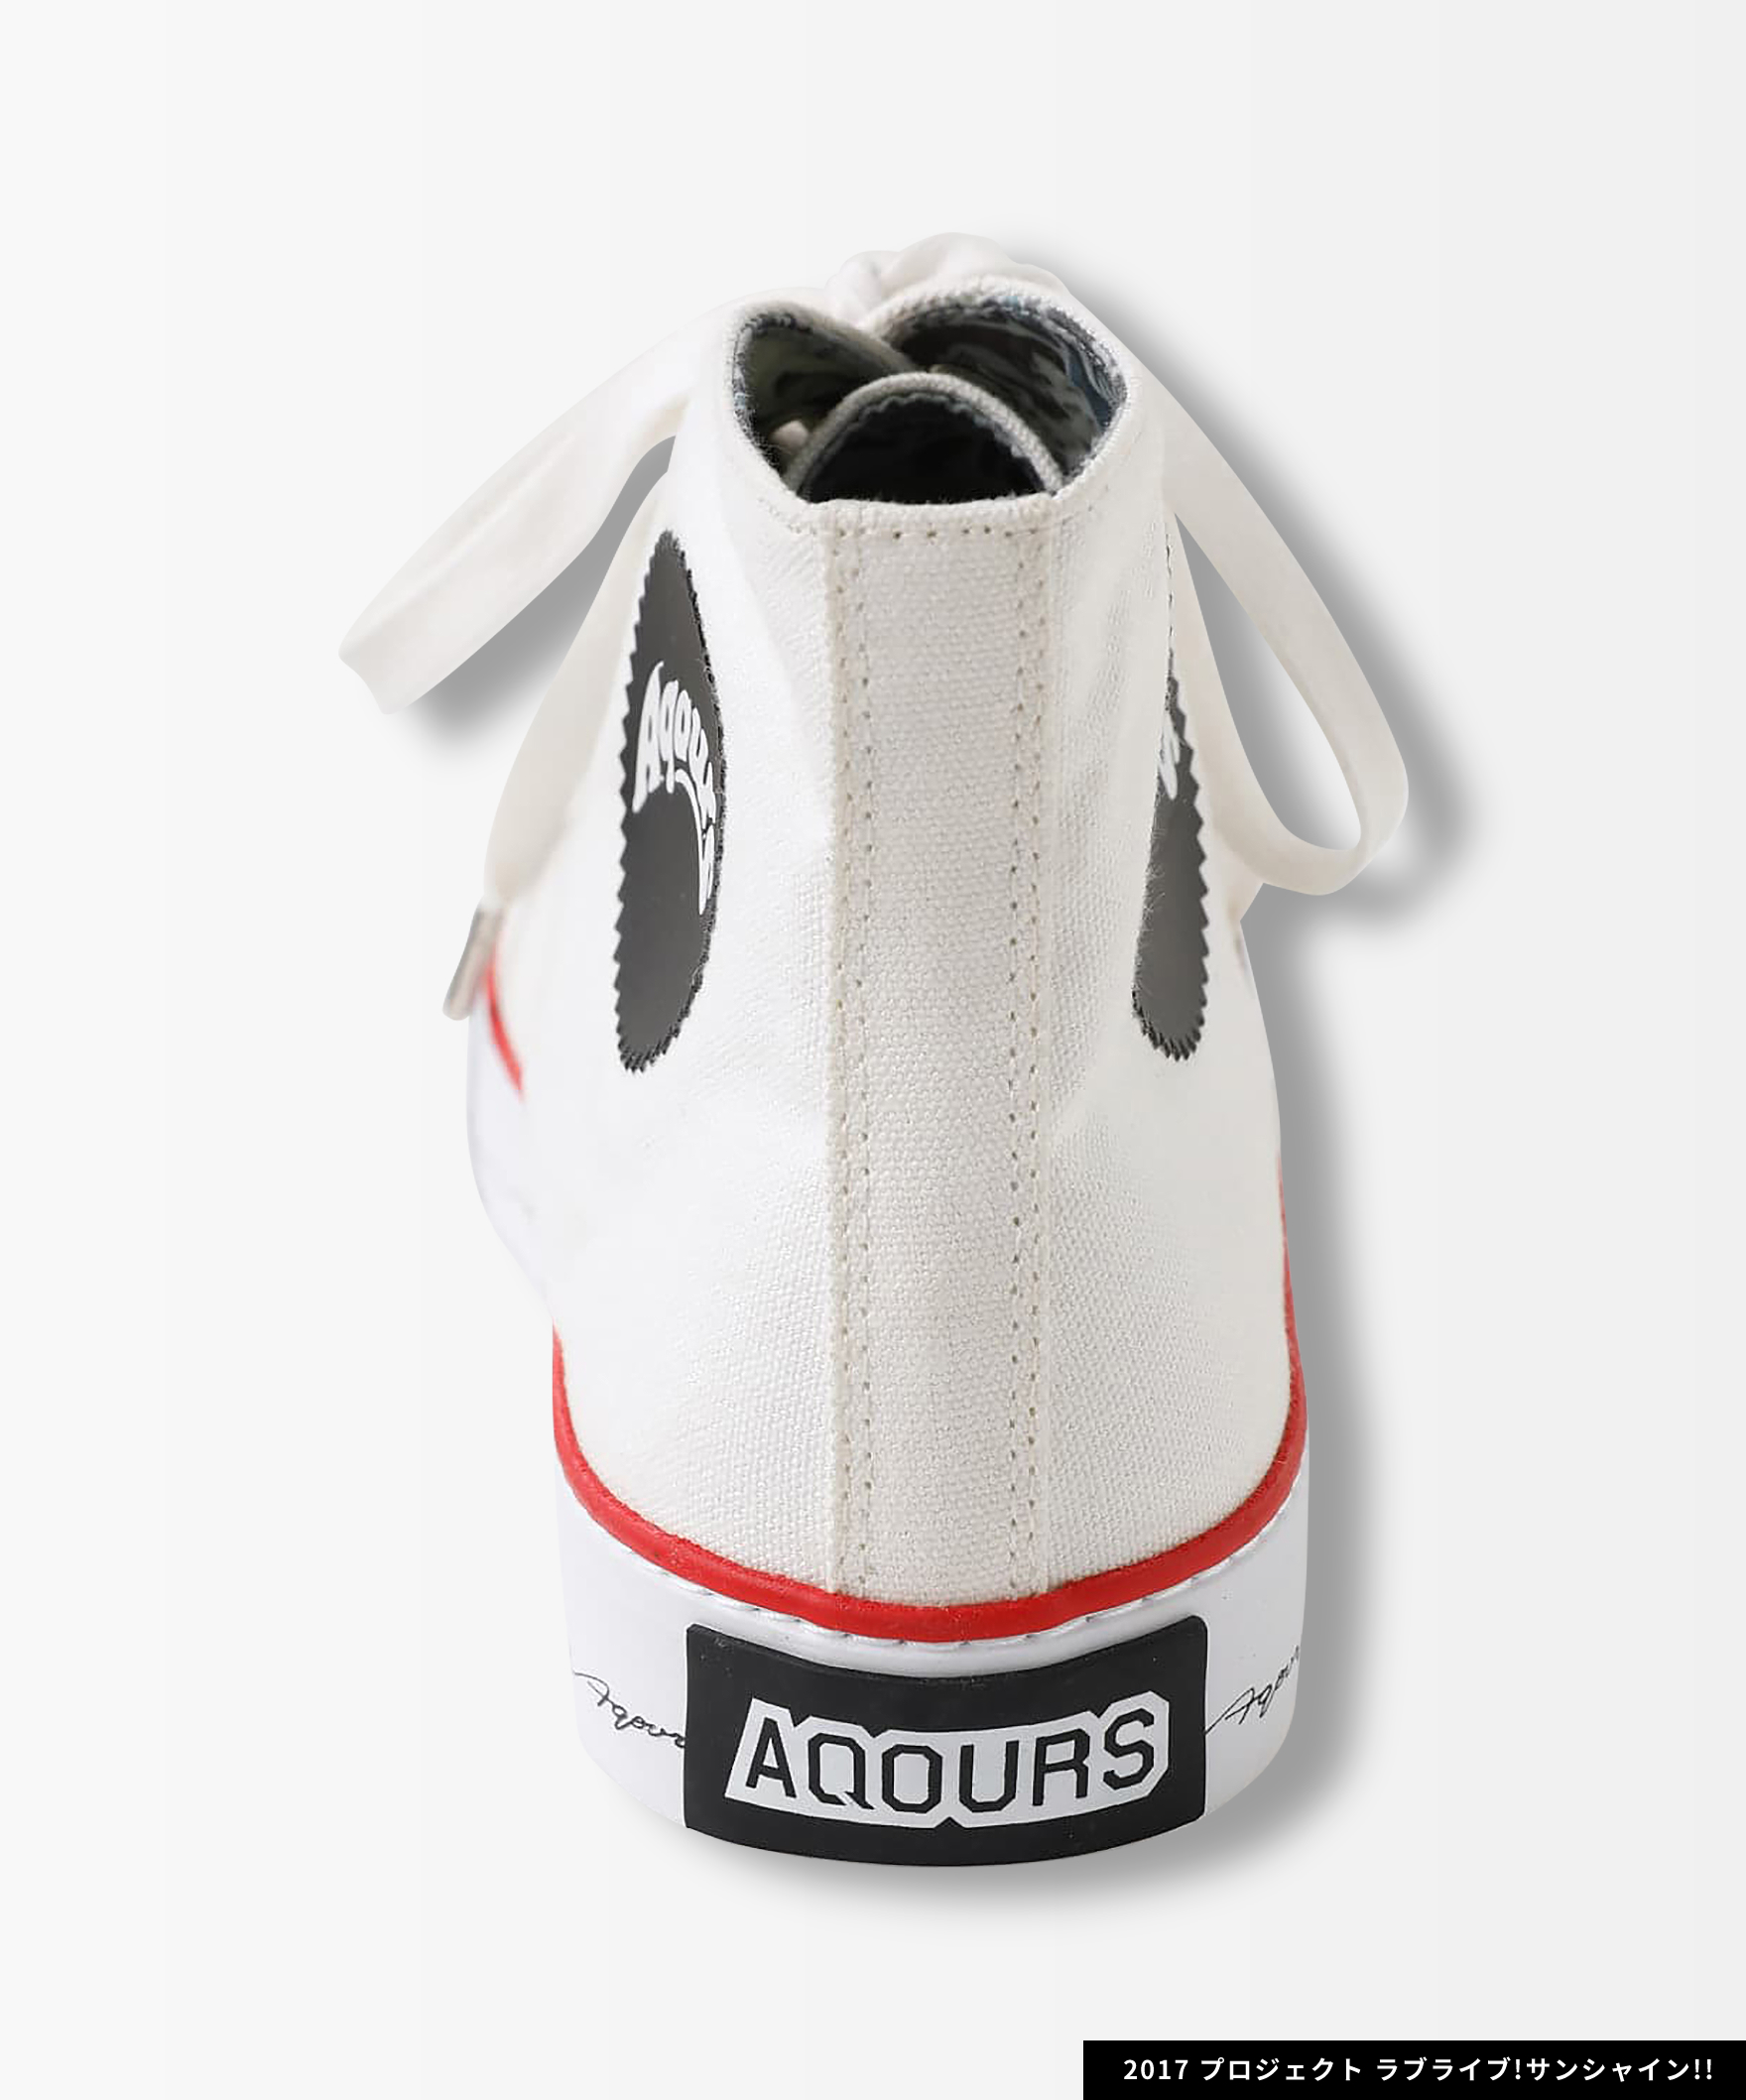 Aqours x R4G ハイカットシューズ